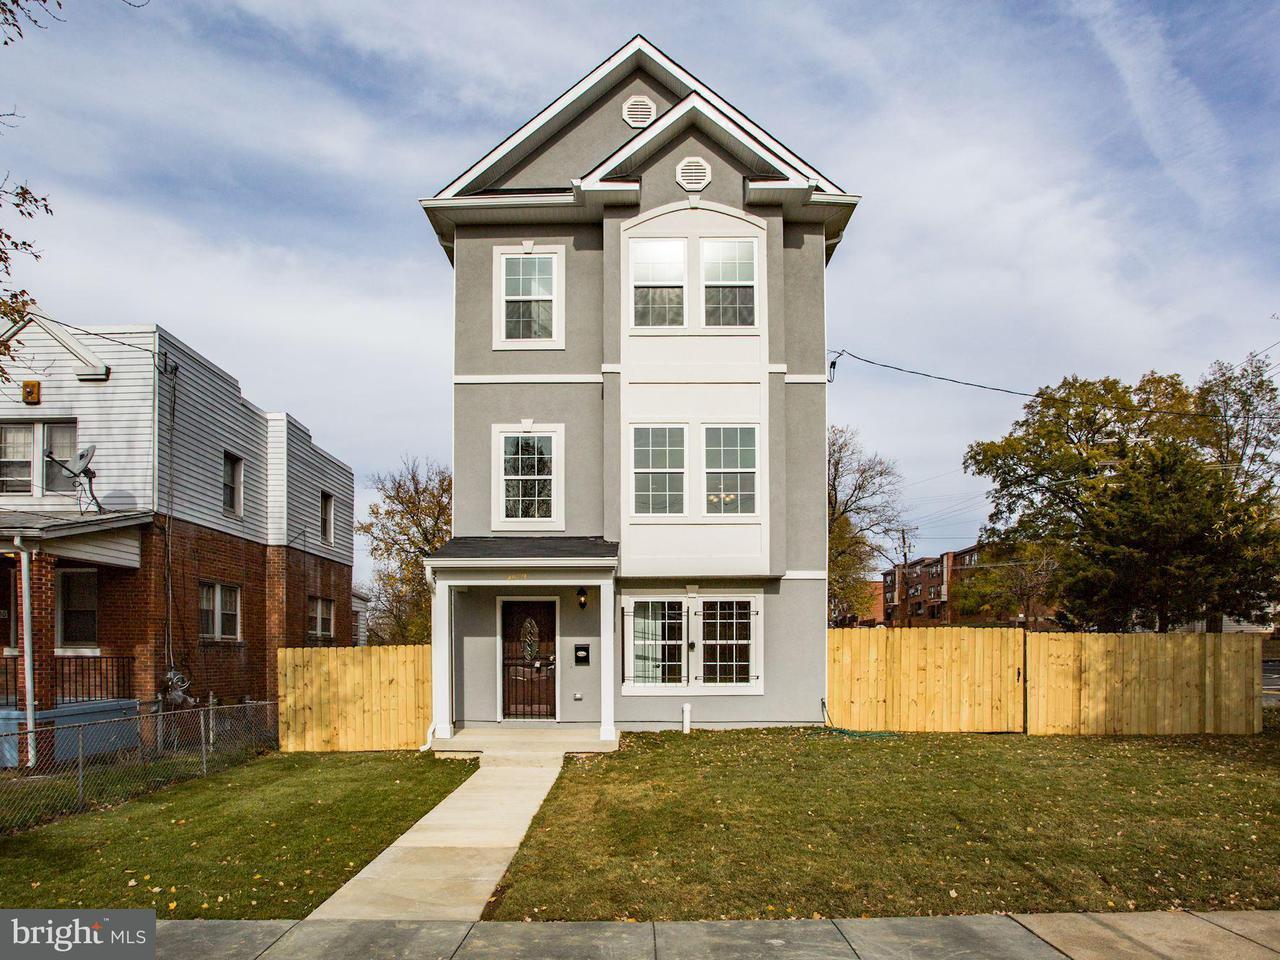 Single Family Home for Sale at 4952 BLAINE ST NE 4952 BLAINE ST NE Washington, District Of Columbia 20019 United States